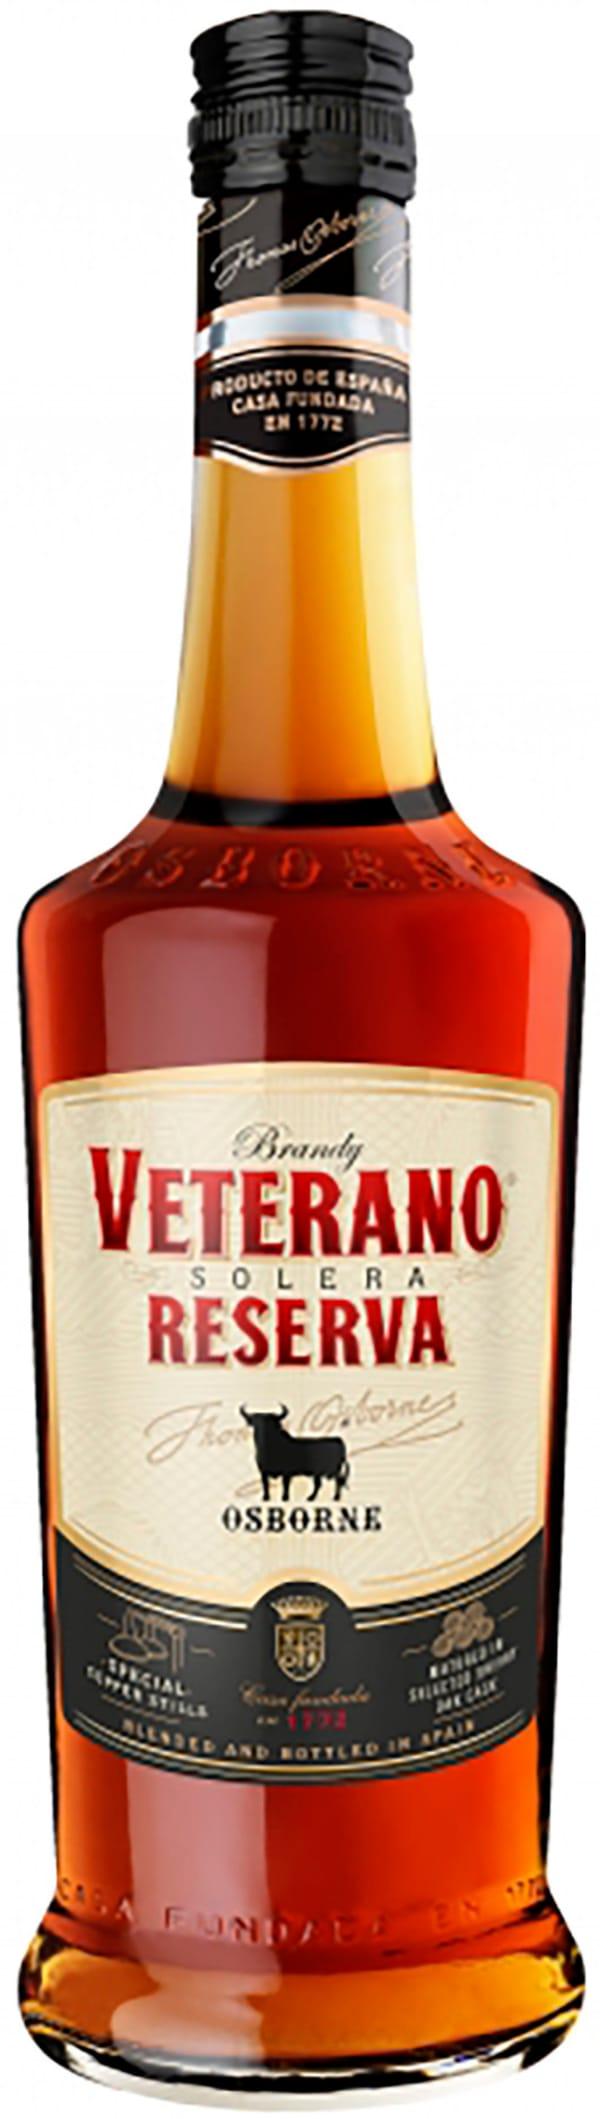 Veterano Solera Reserva